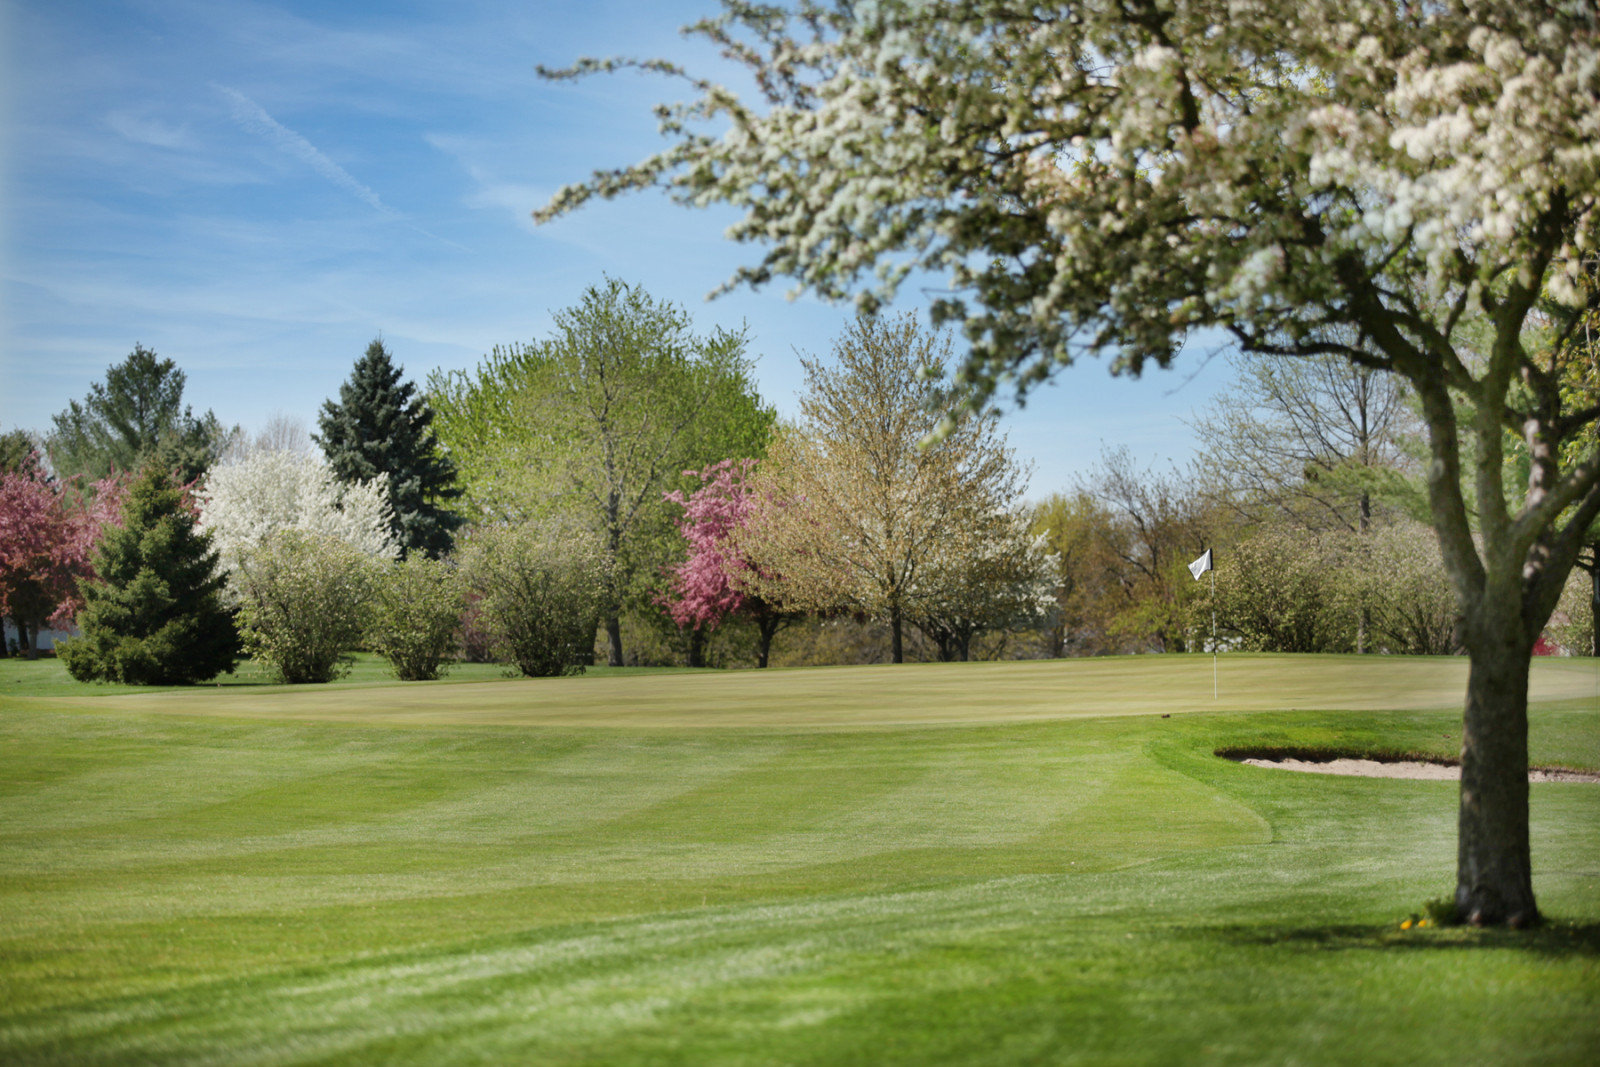 Mattoon golf and cc Spring